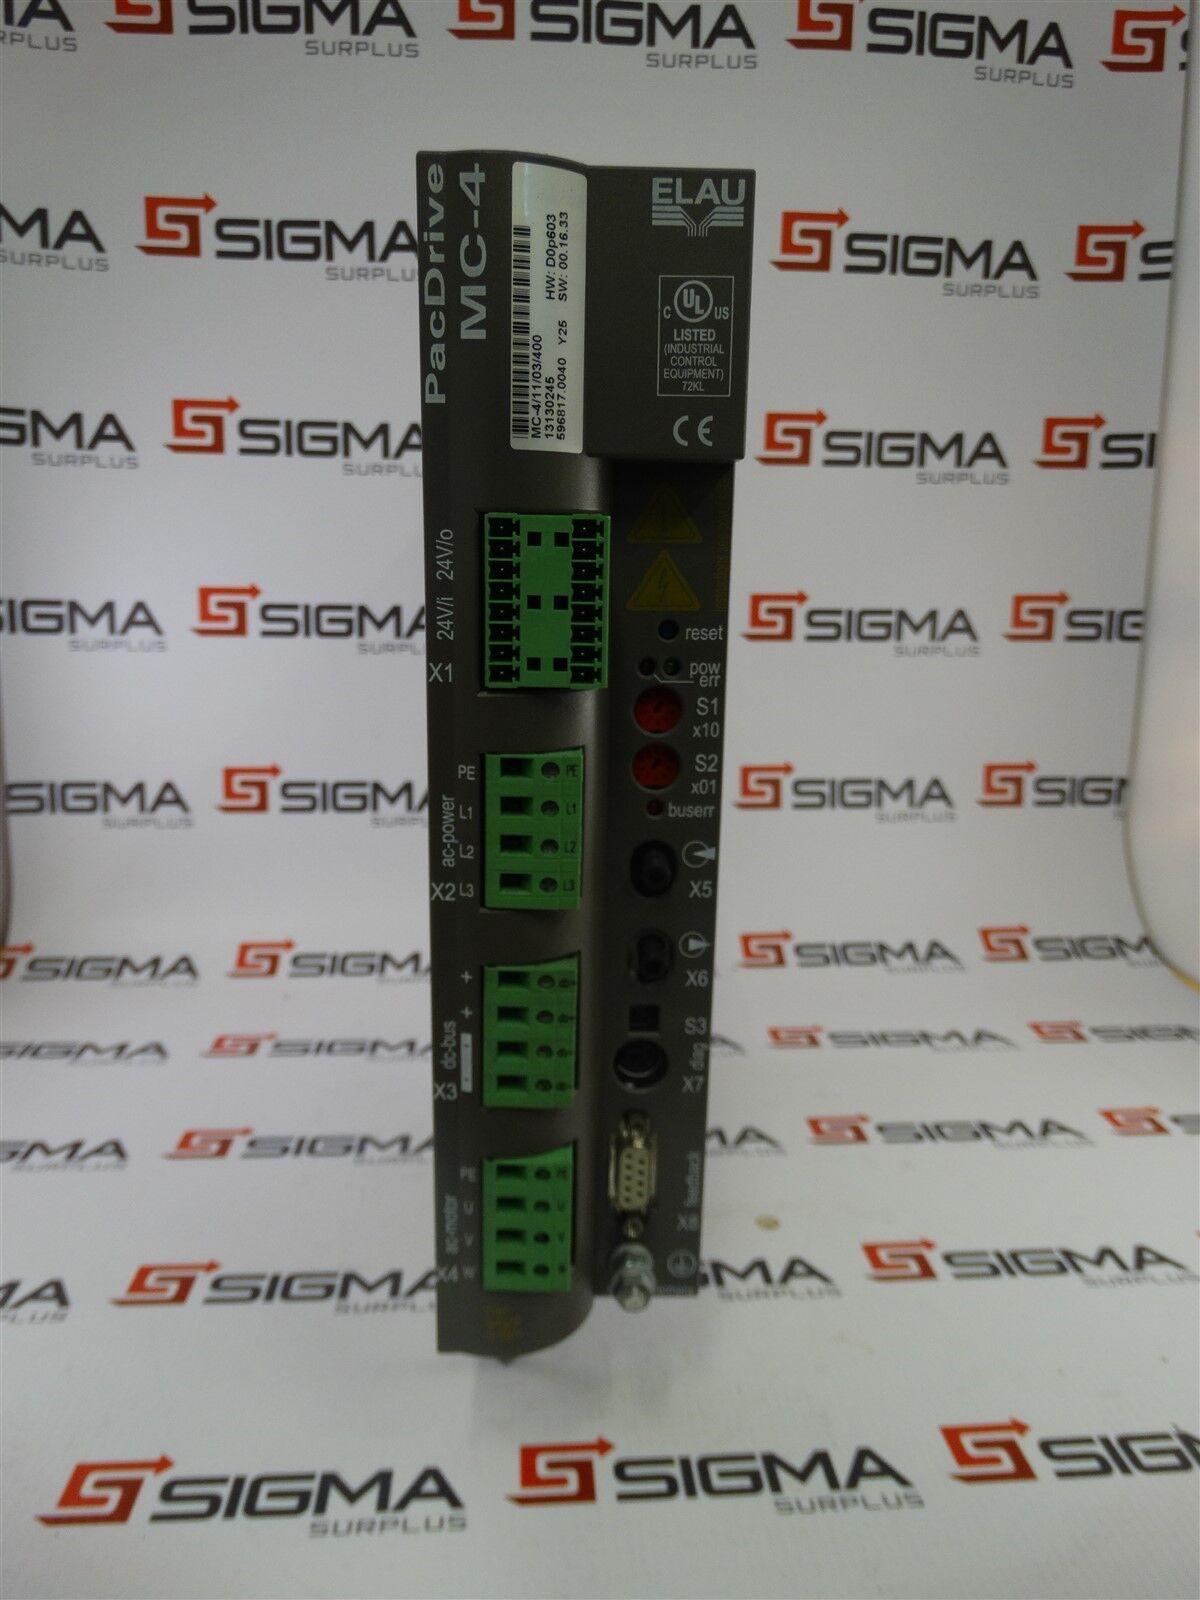 Schneider Electric Elau PacDrive MC-4/11/03/400 HW: E0R603 SW: 00.12.31